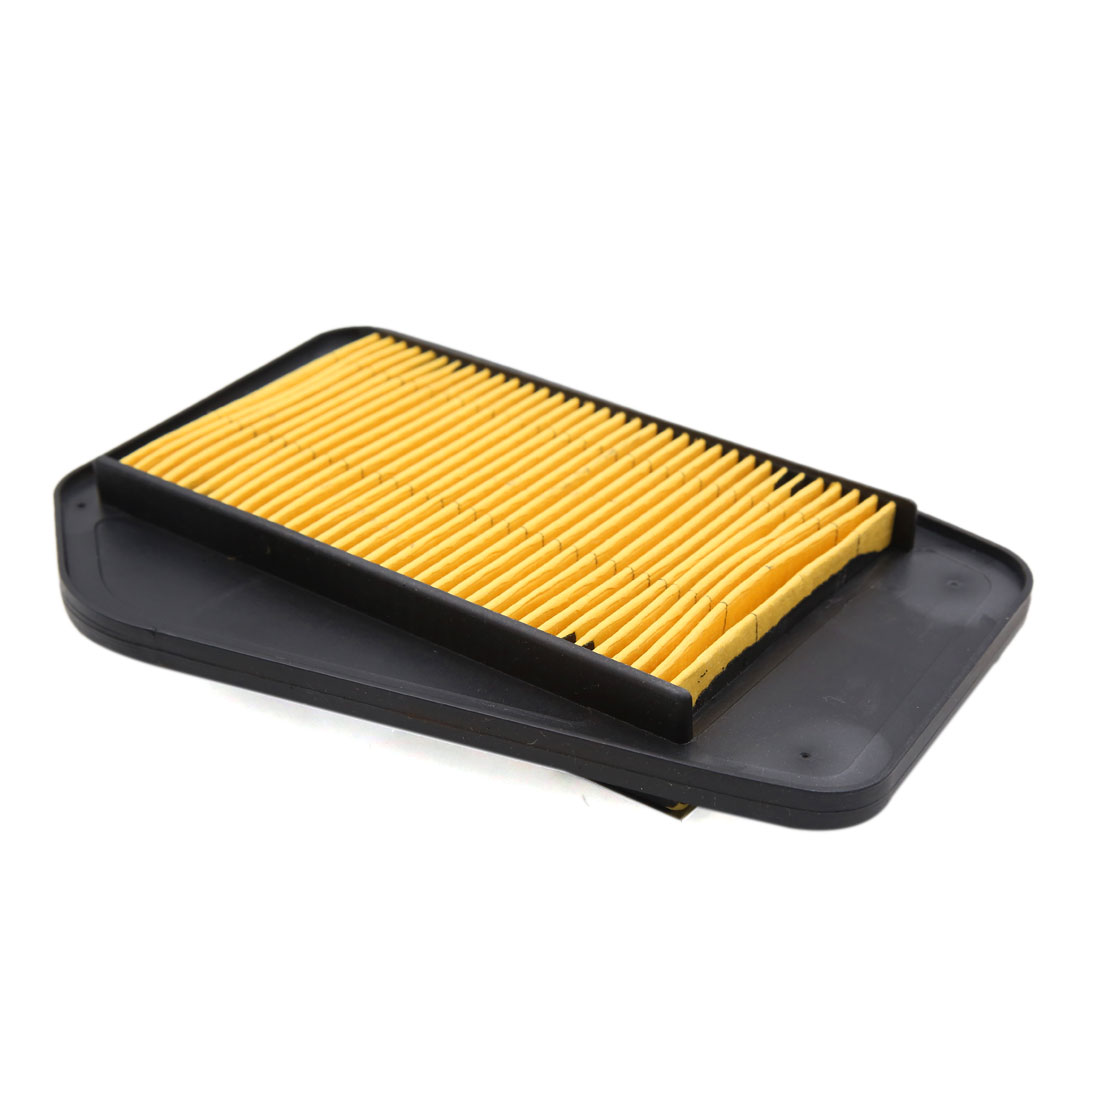 Motorcycle Air Intake Filter Cleaner for 04-14 Honda CBR125R 02-12 CBR150R